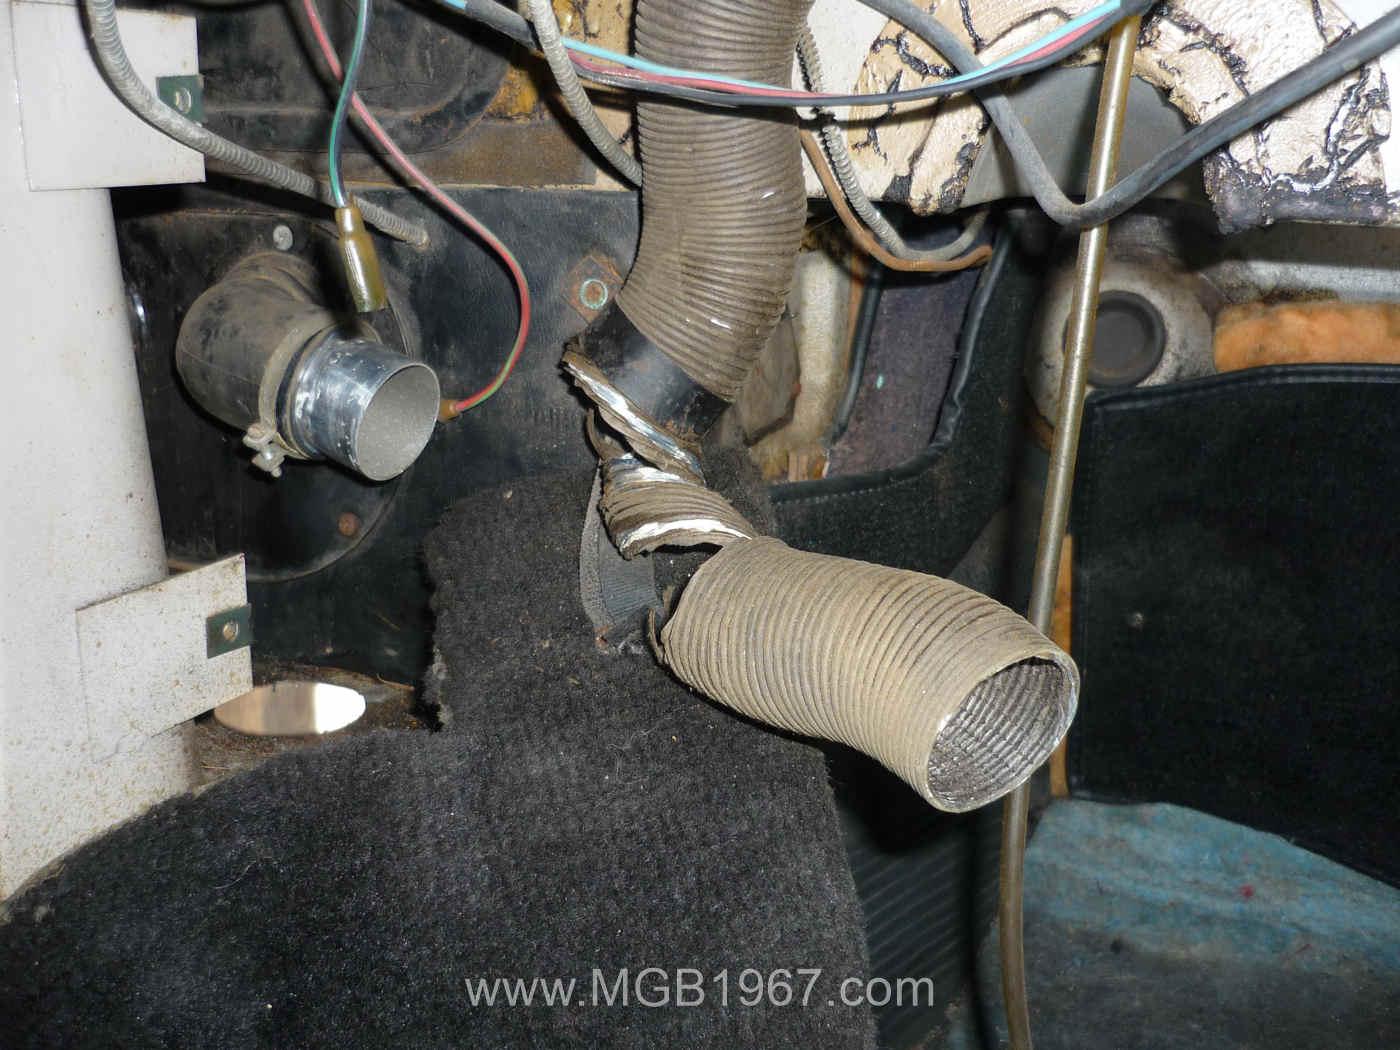 f6aac2 1975 mgb fuse box wiring library mg midget fuse box lucas fuse box (4) mgb 7fj series